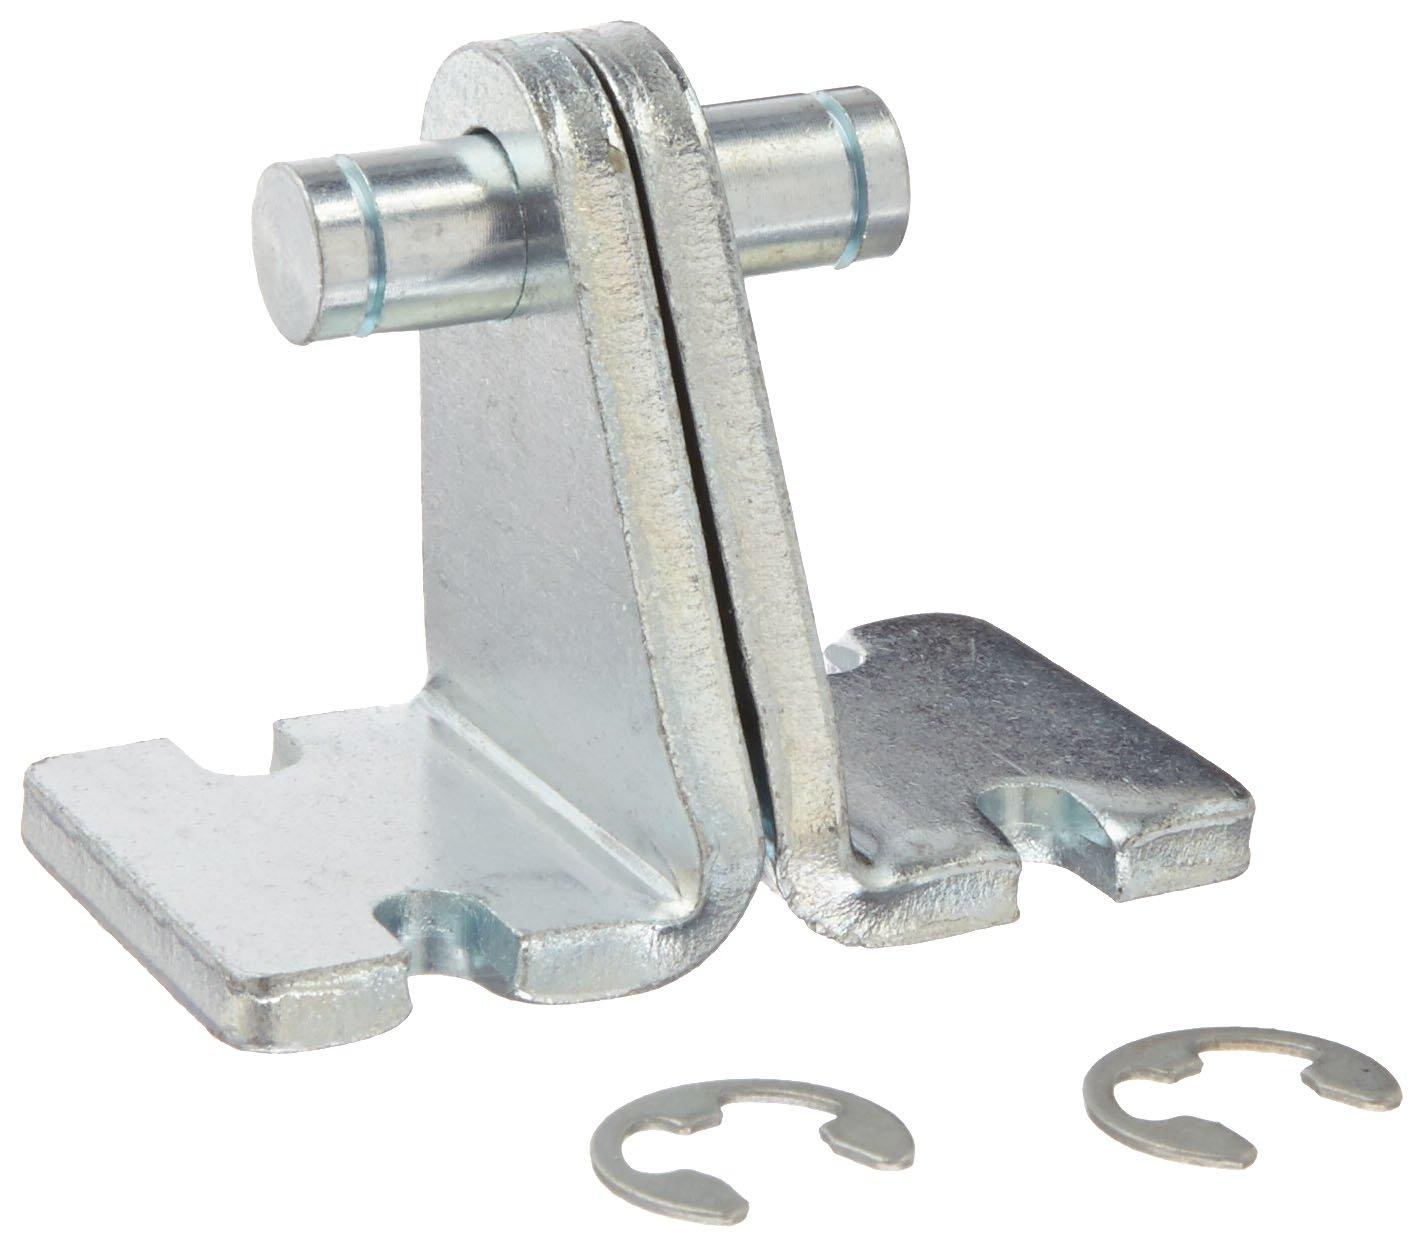 Parker L071320400  Pivot Bracket Universal or Rear Pivot Mount for 1 1//2 1 3//4 Bore